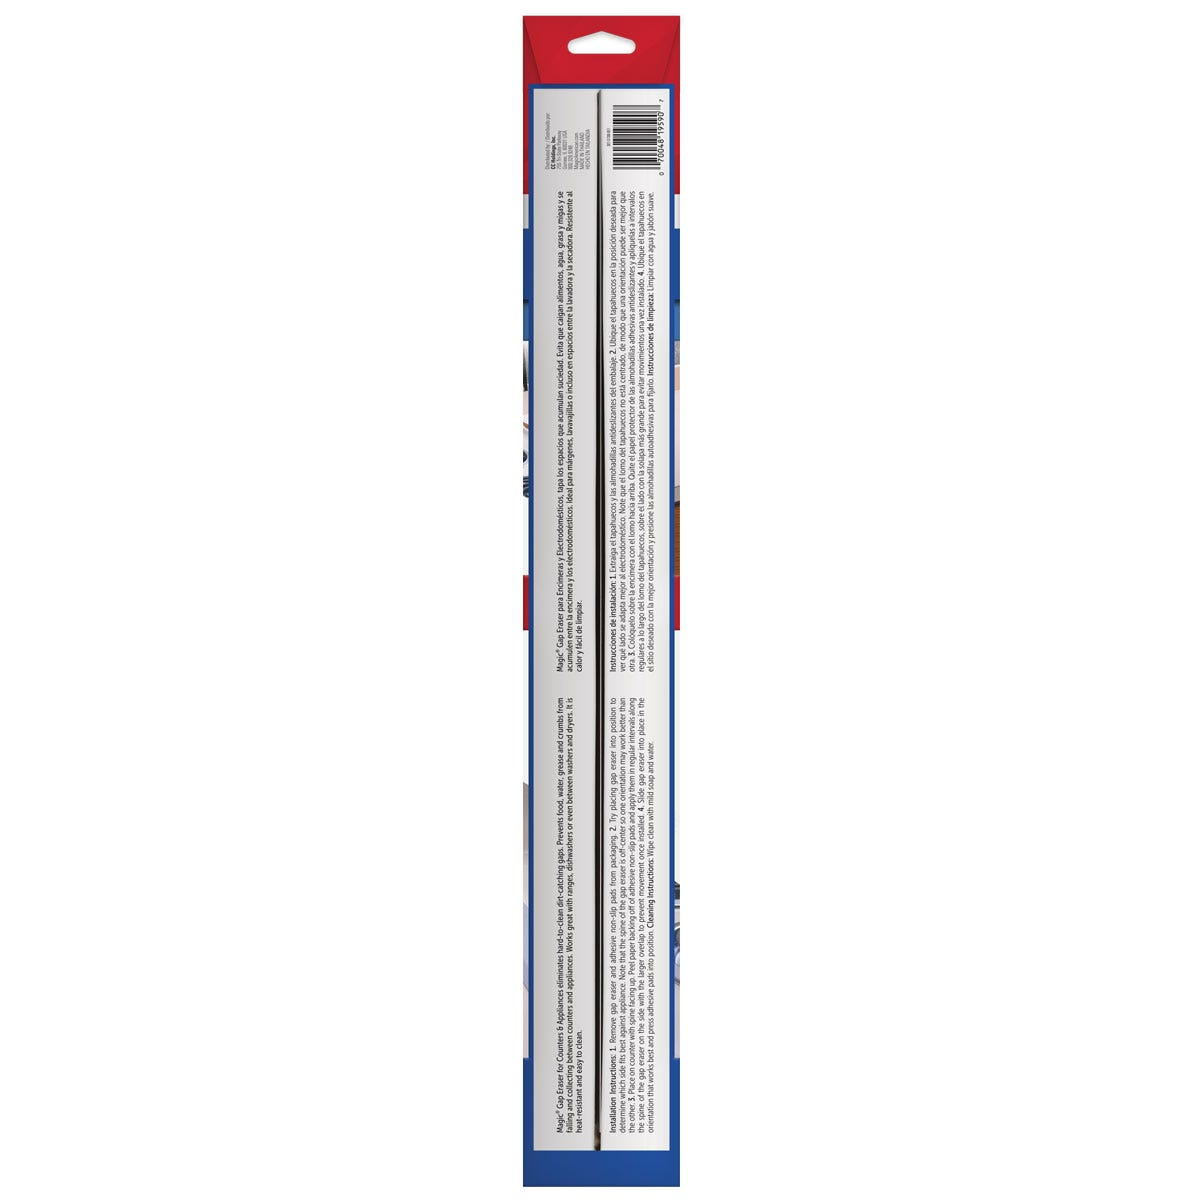 https://googone.com/media/catalog/product/c/o/countertop-appliance-gap-eraser_back.jpg